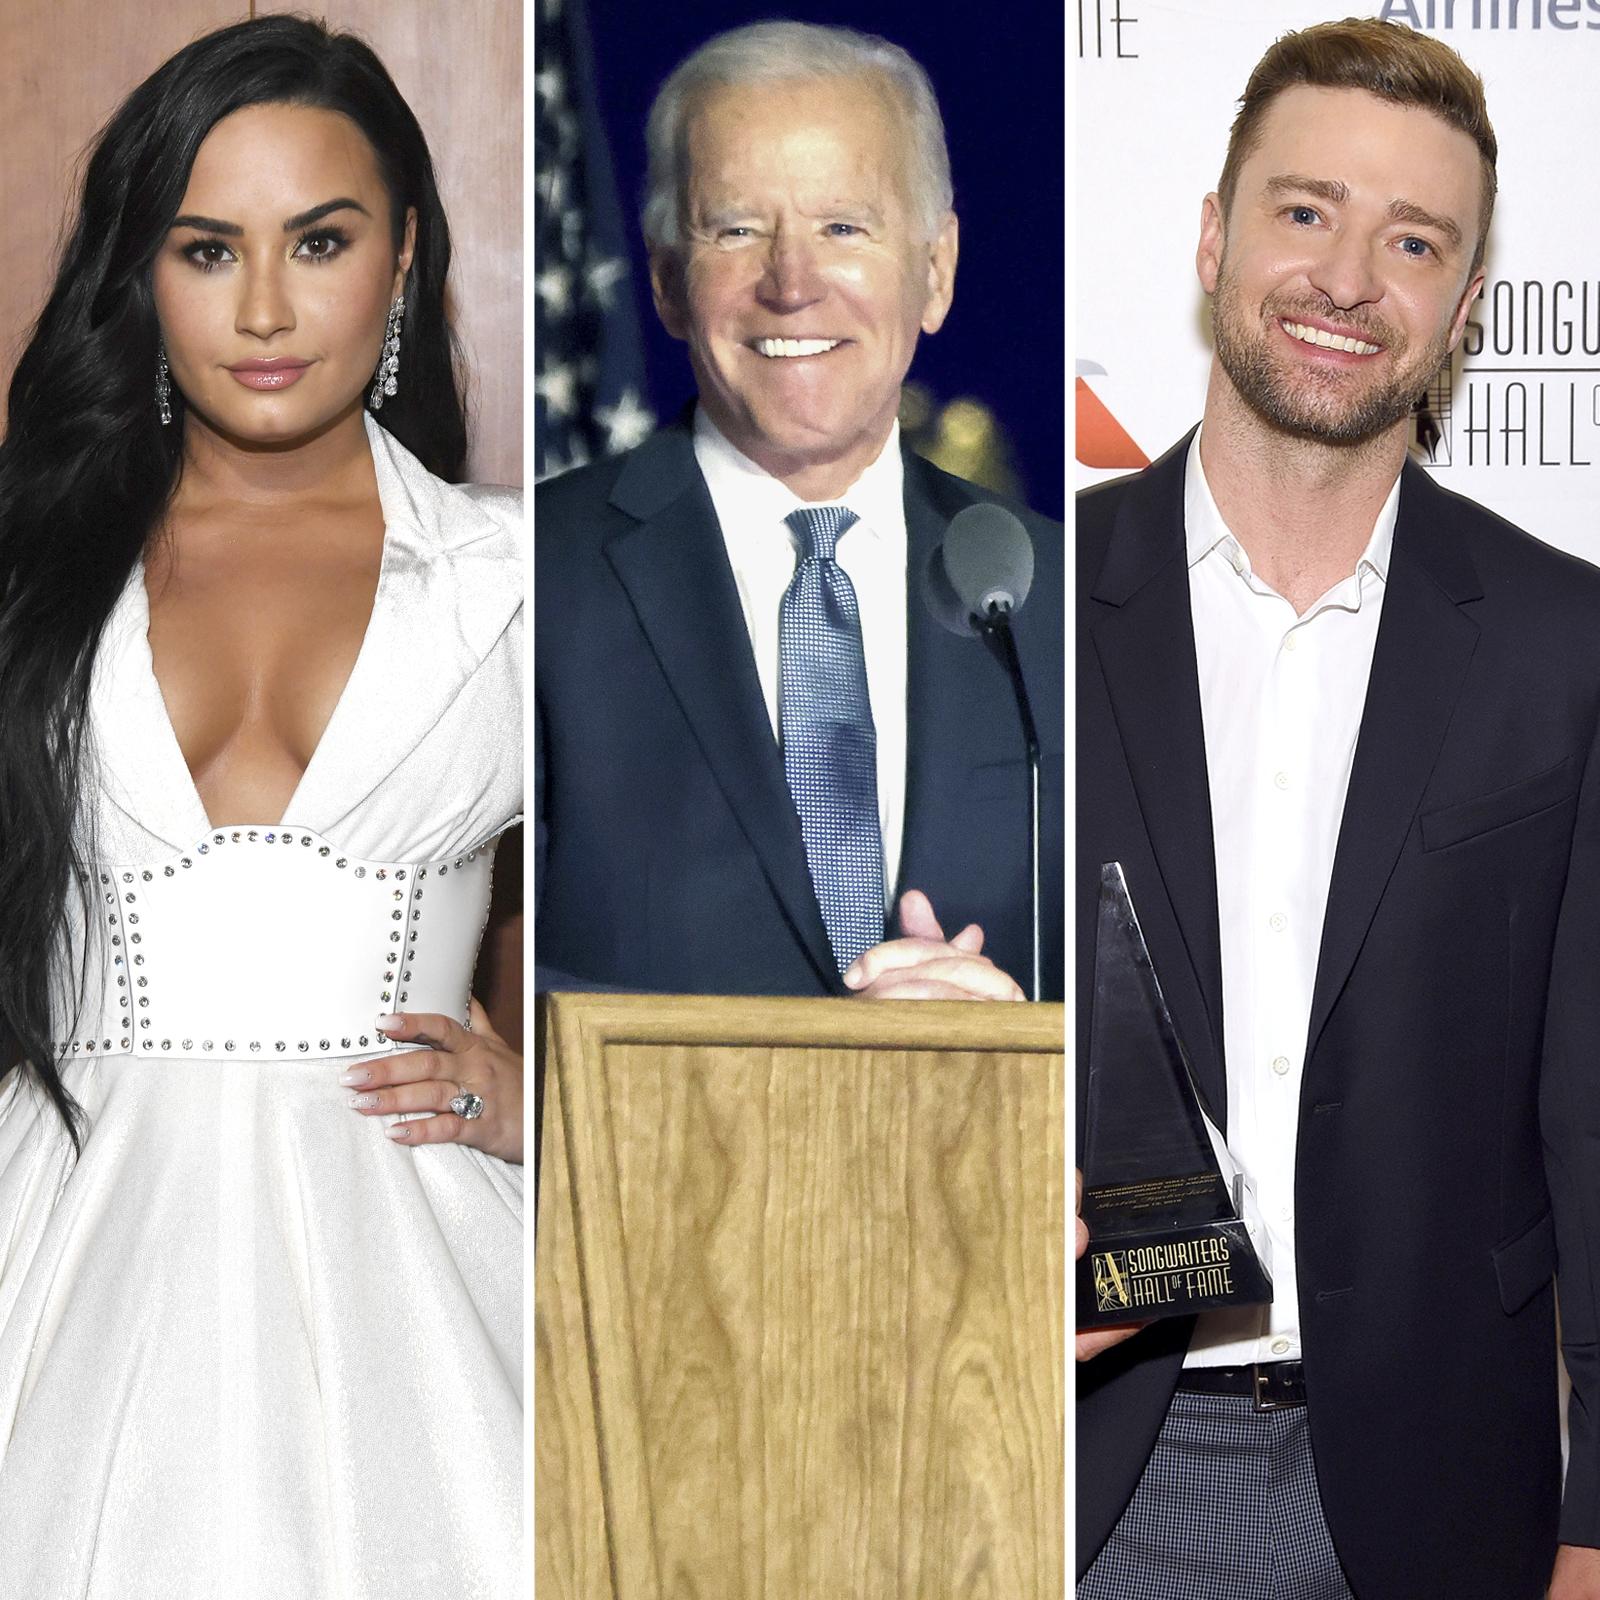 Demi Lovato, Joe Biden, Justin Timberlake